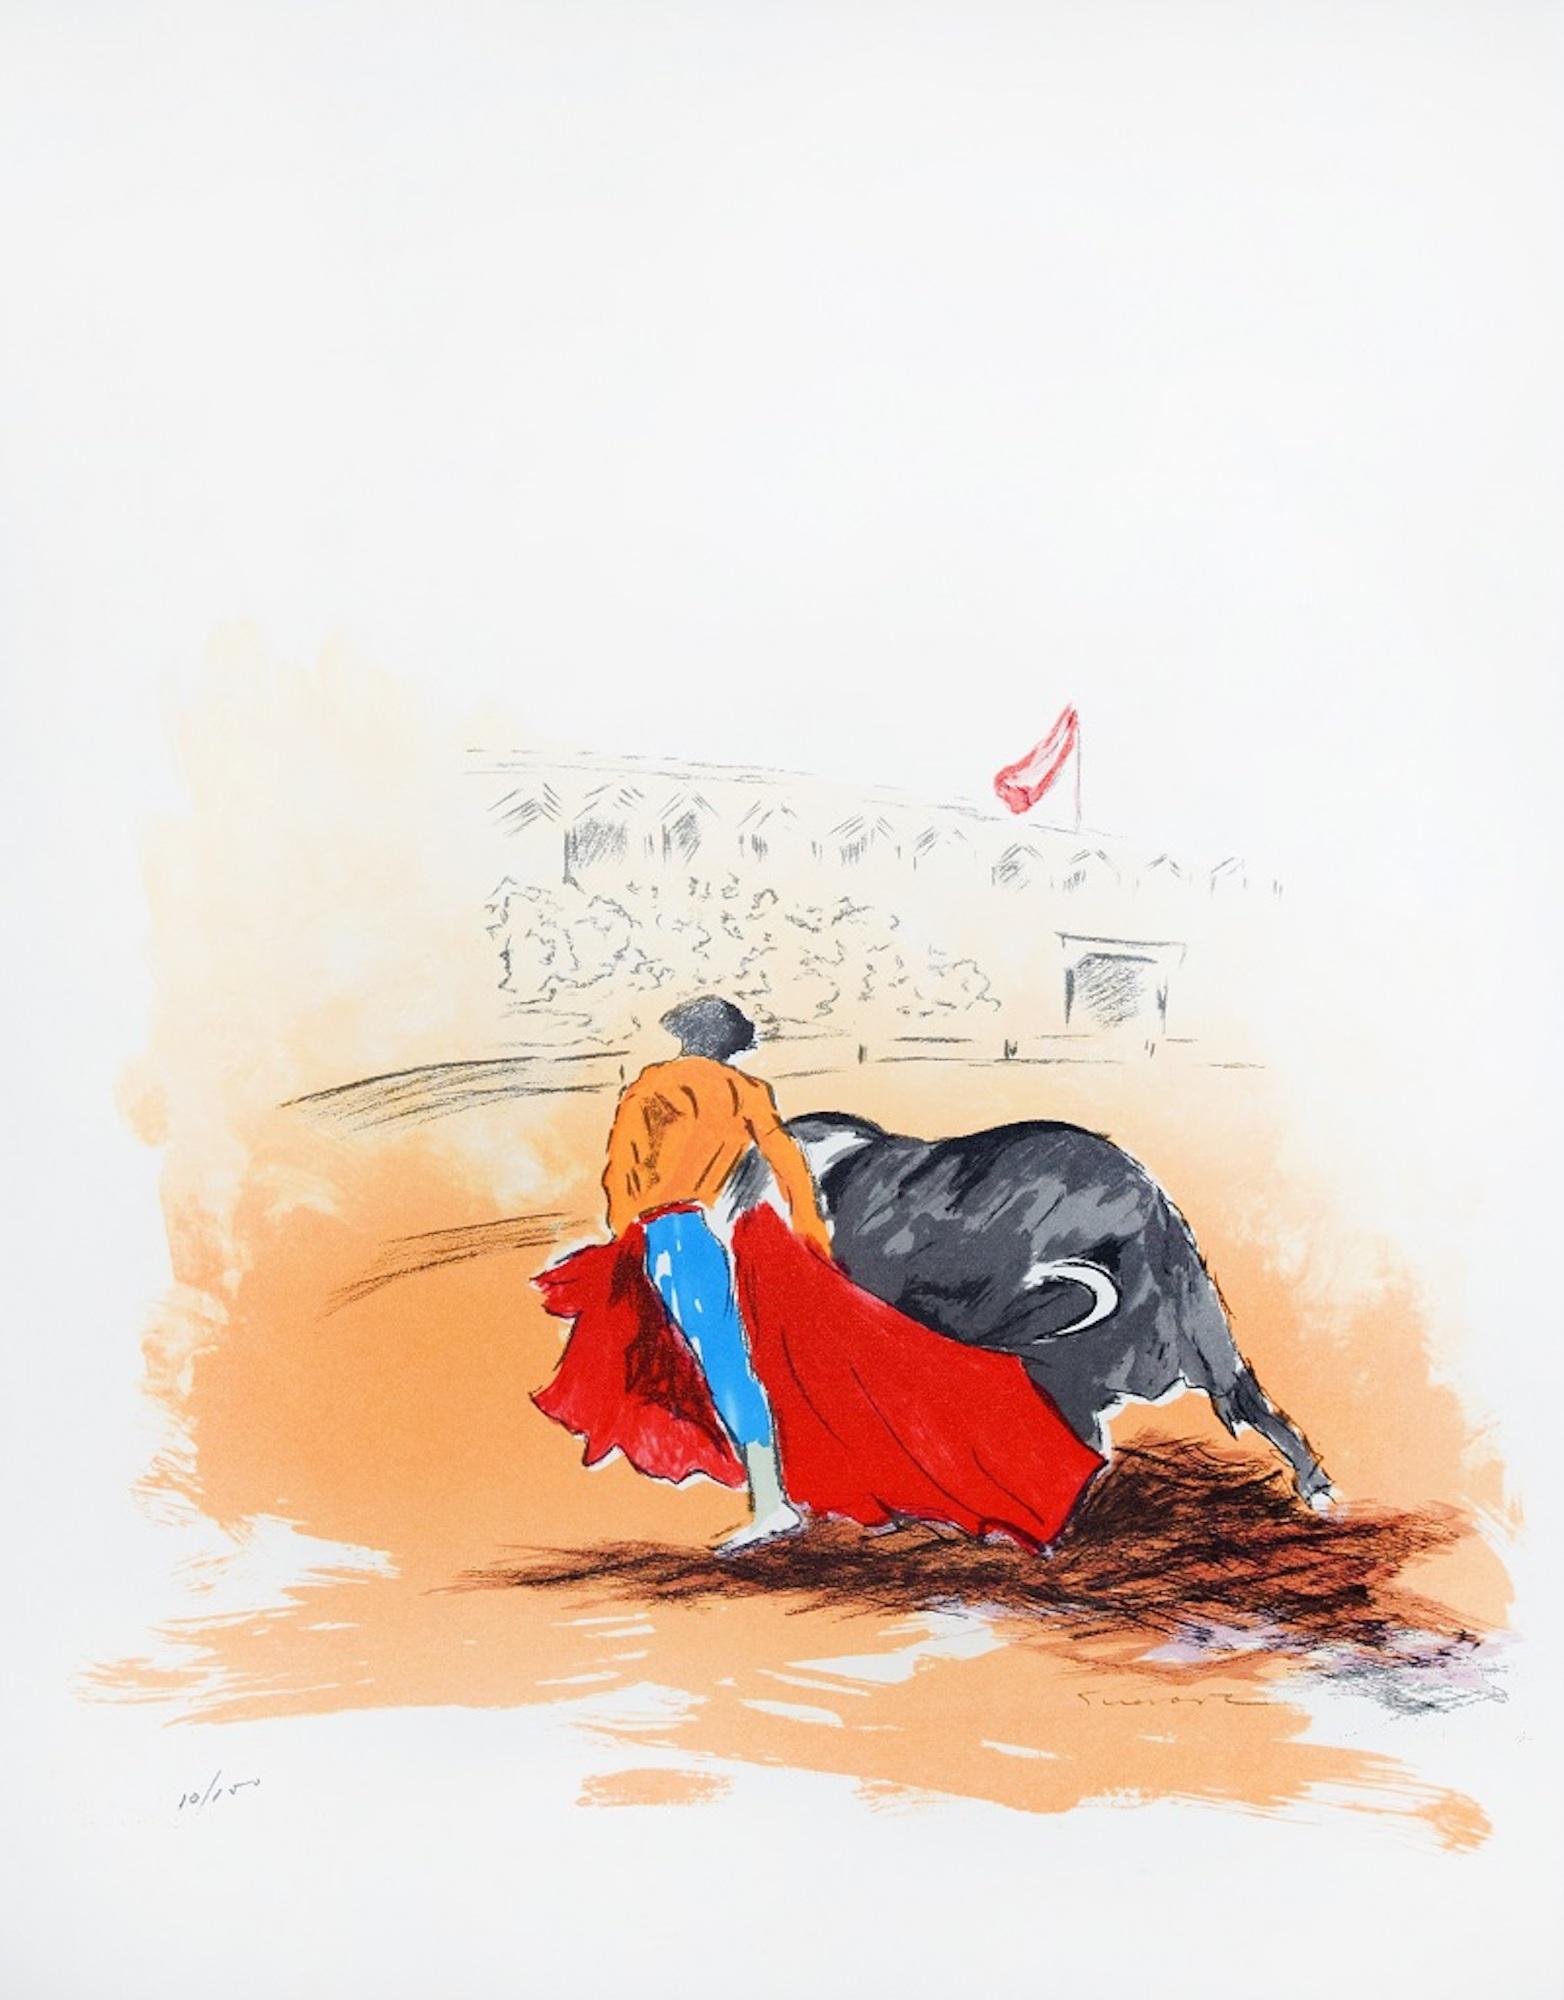 Matador - Original Lithograph by José Guevara - 1990s